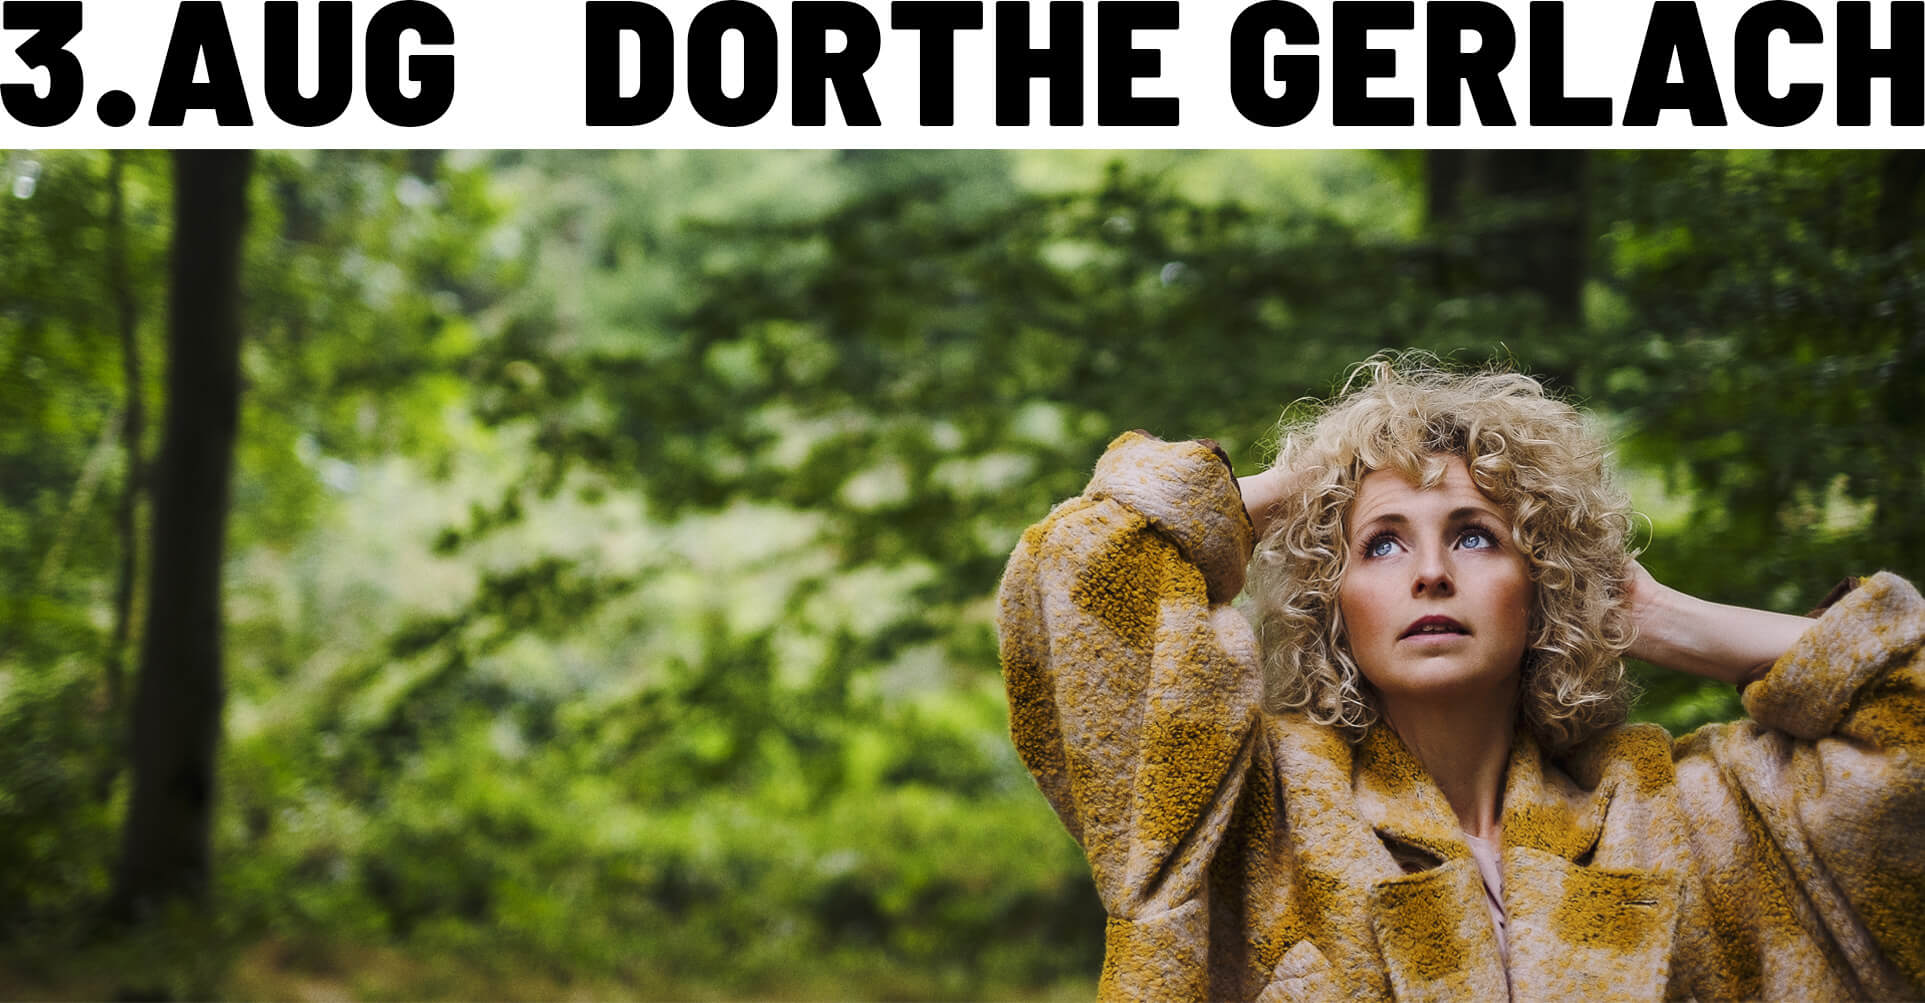 Dorthe Gerlach - Cinema Concert - 3. august